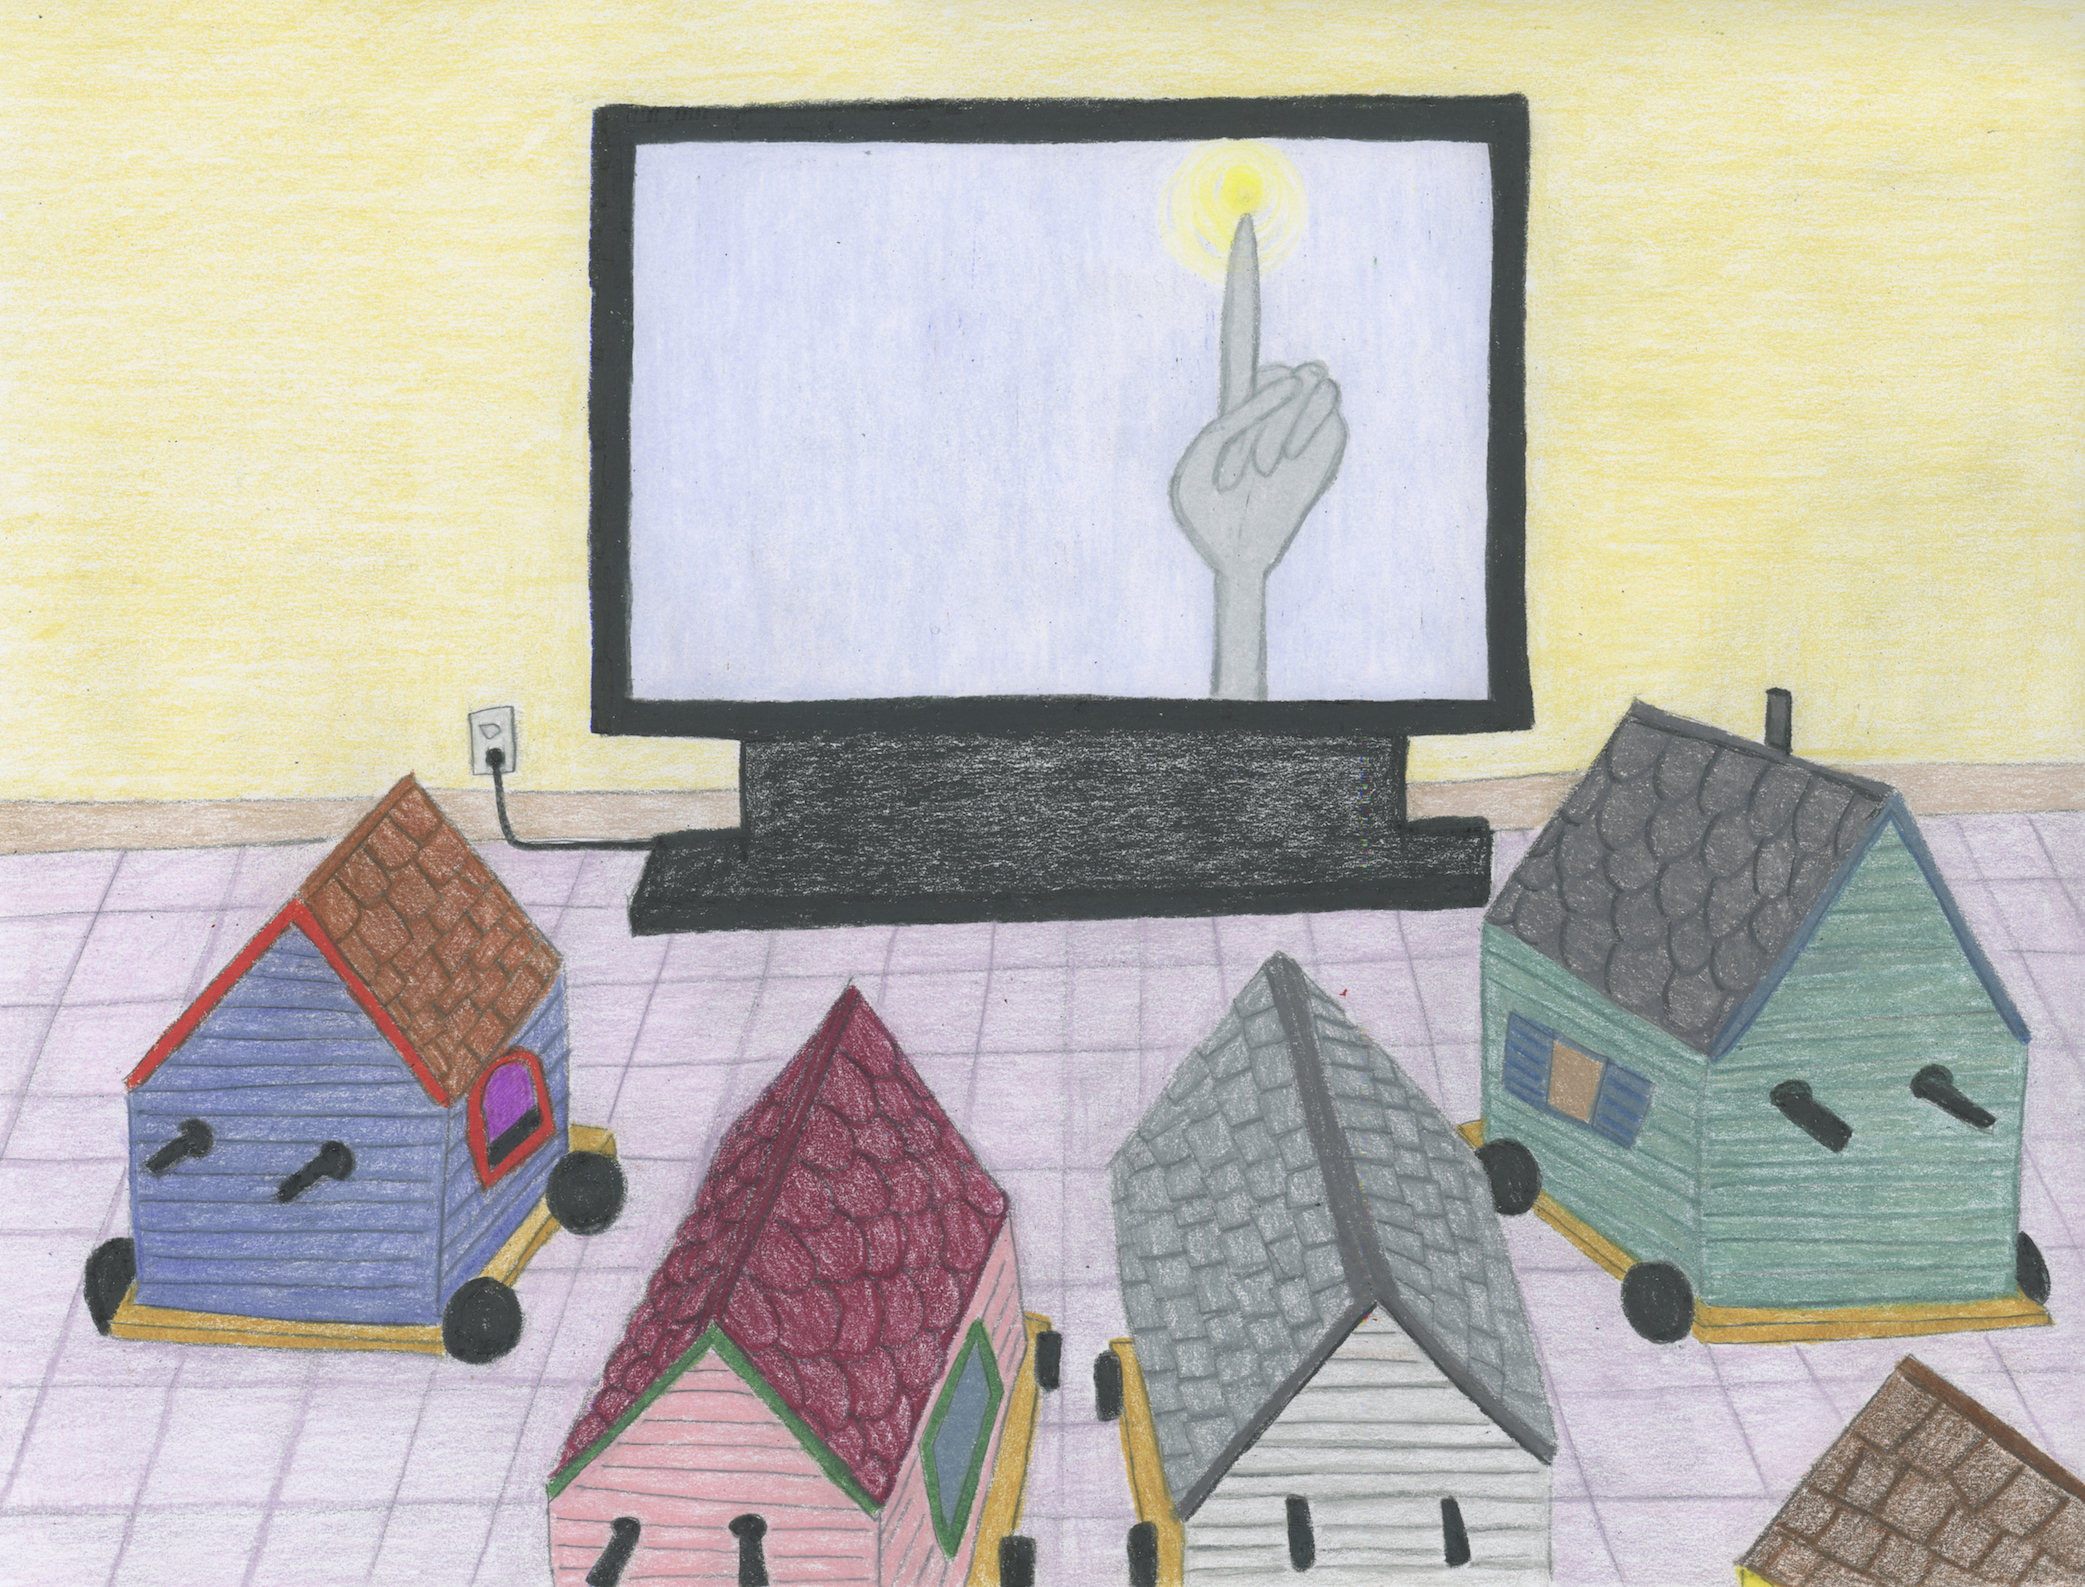 Sherry Walchuk, Homes watching EMDR TV, 2017. Pencil crayon on paper, 11.5 x 8 inches